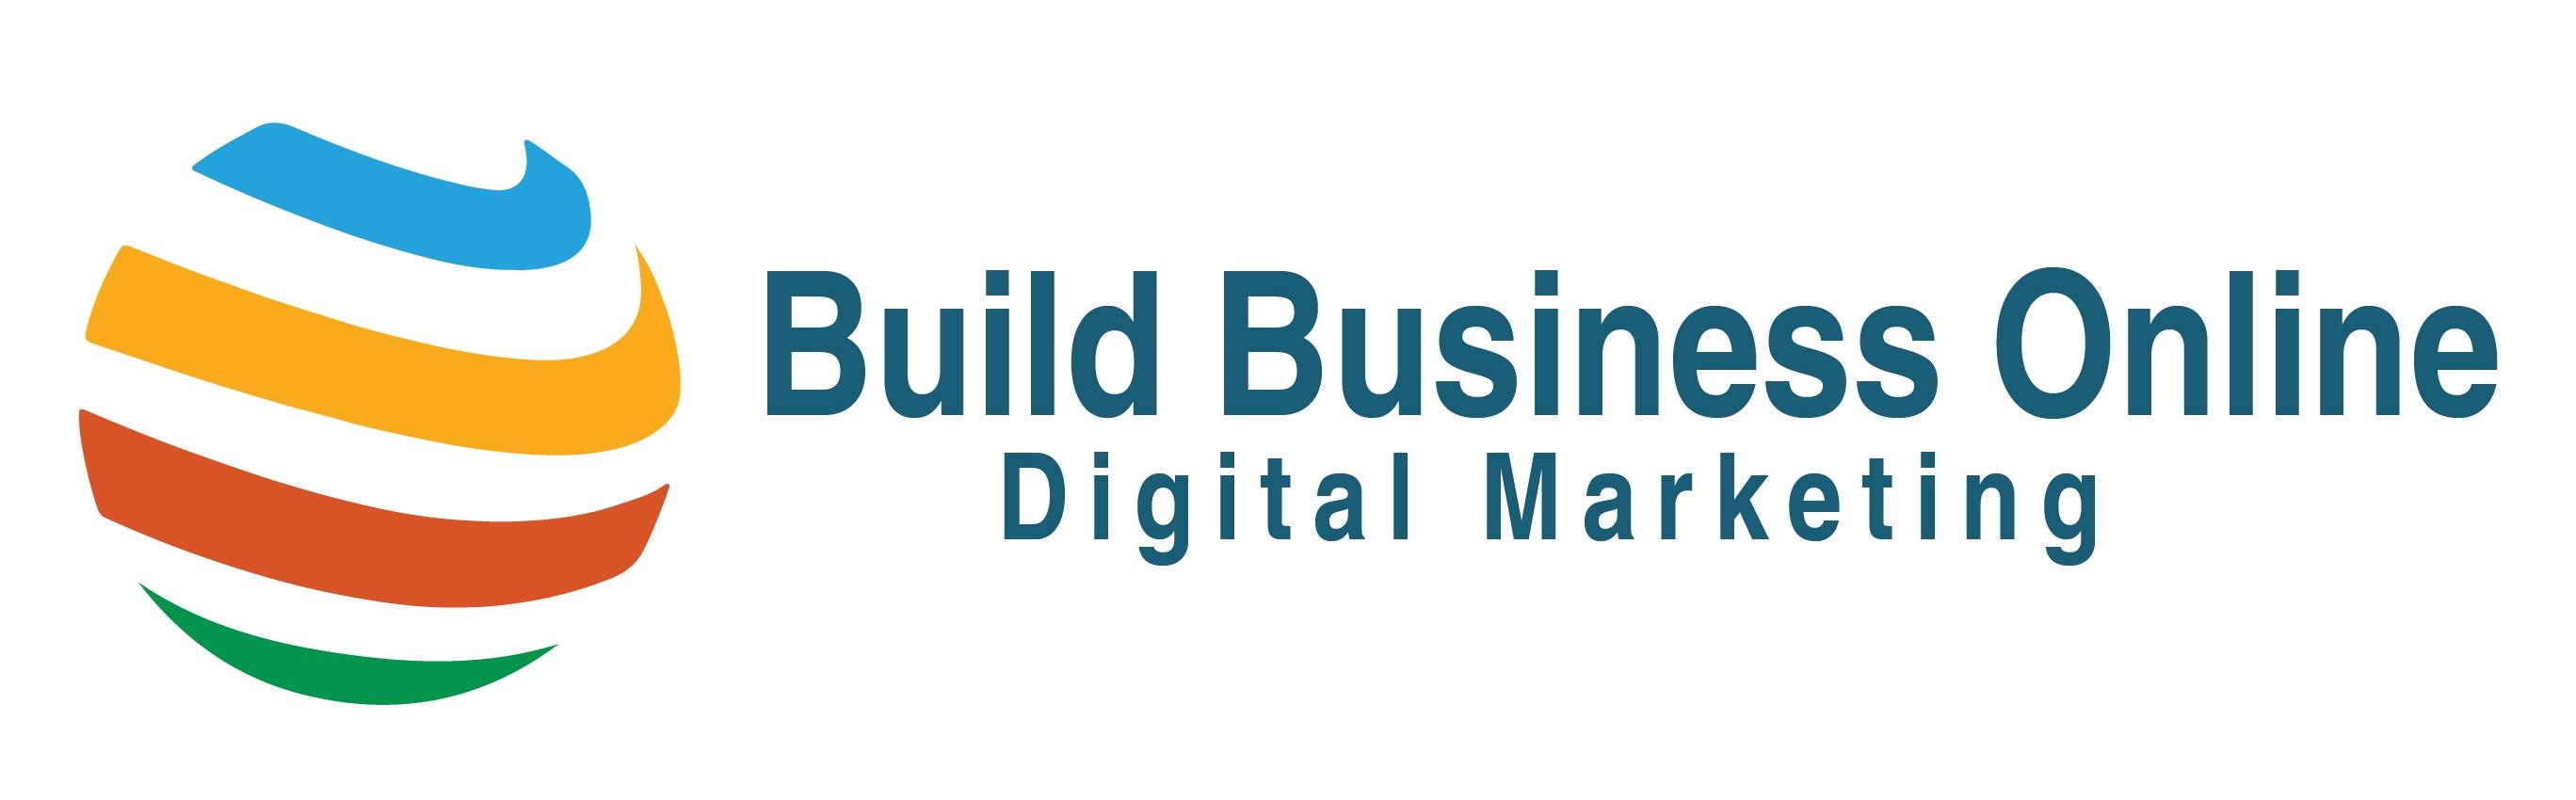 Build Business Online Digital Marketing